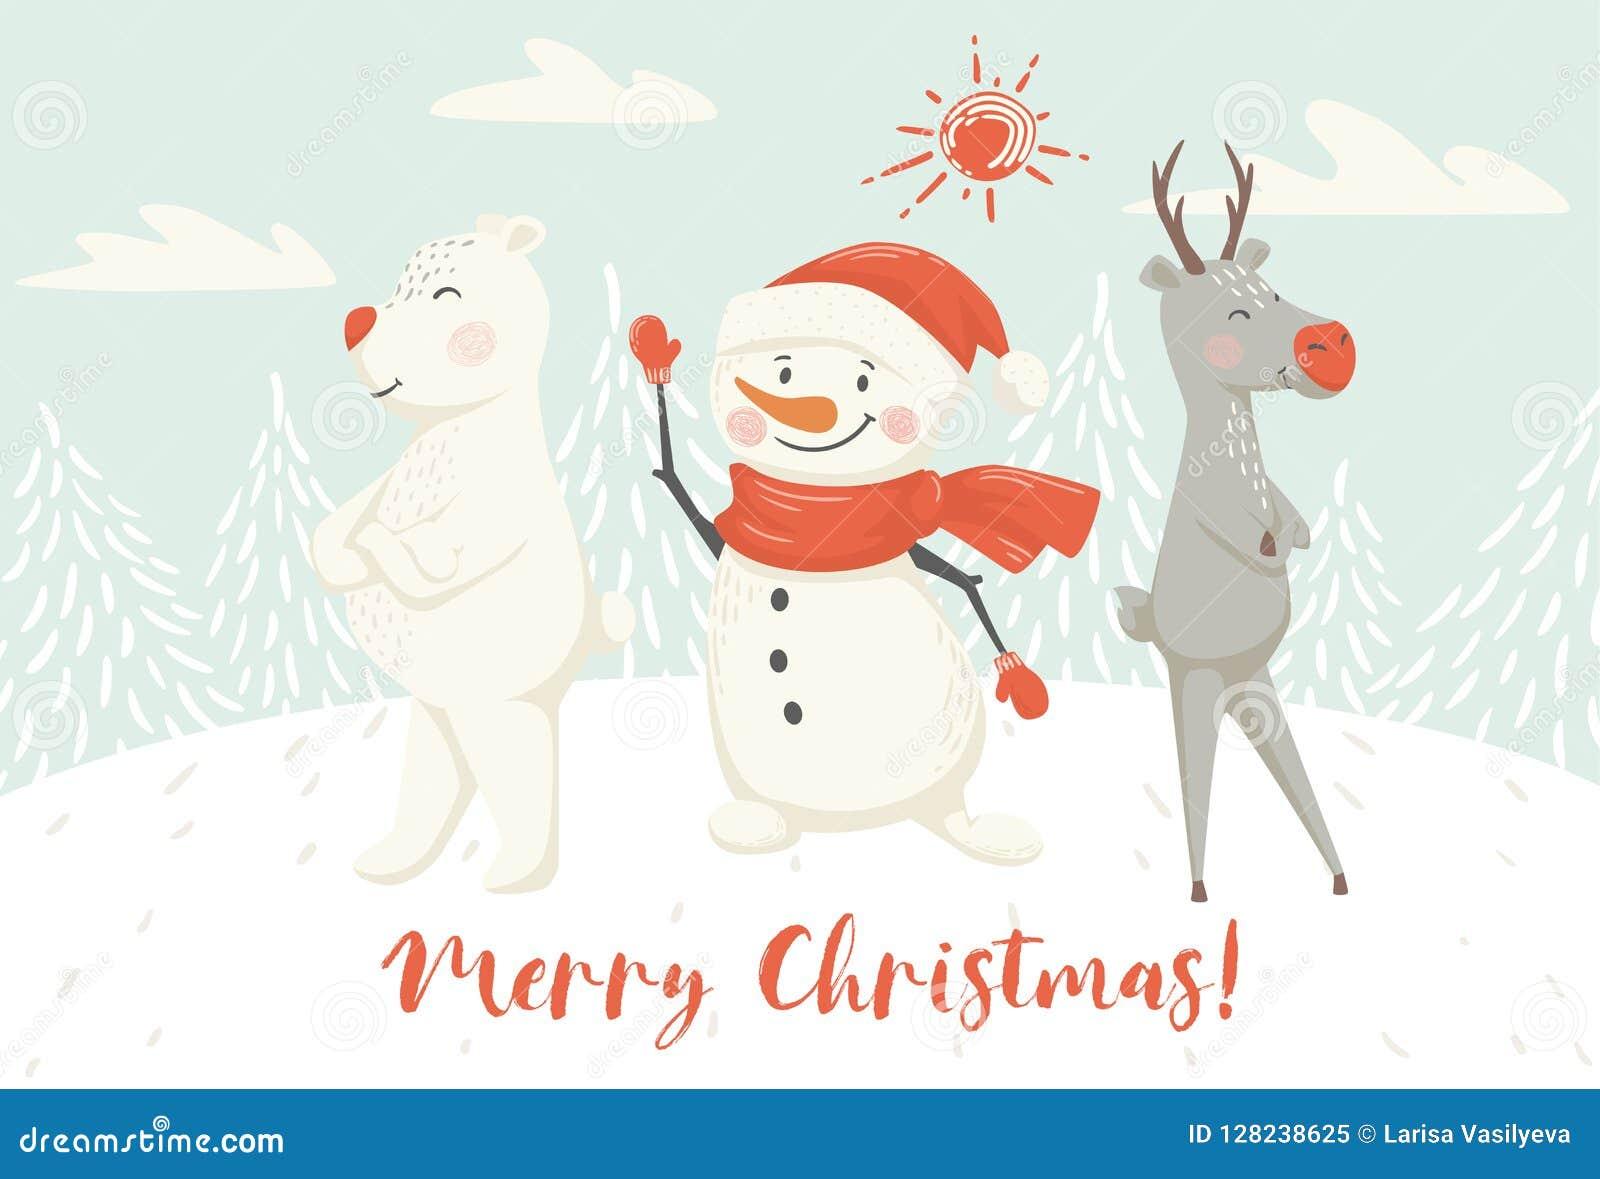 christmas reindeer snowman and bear scandinavian card new year greeting